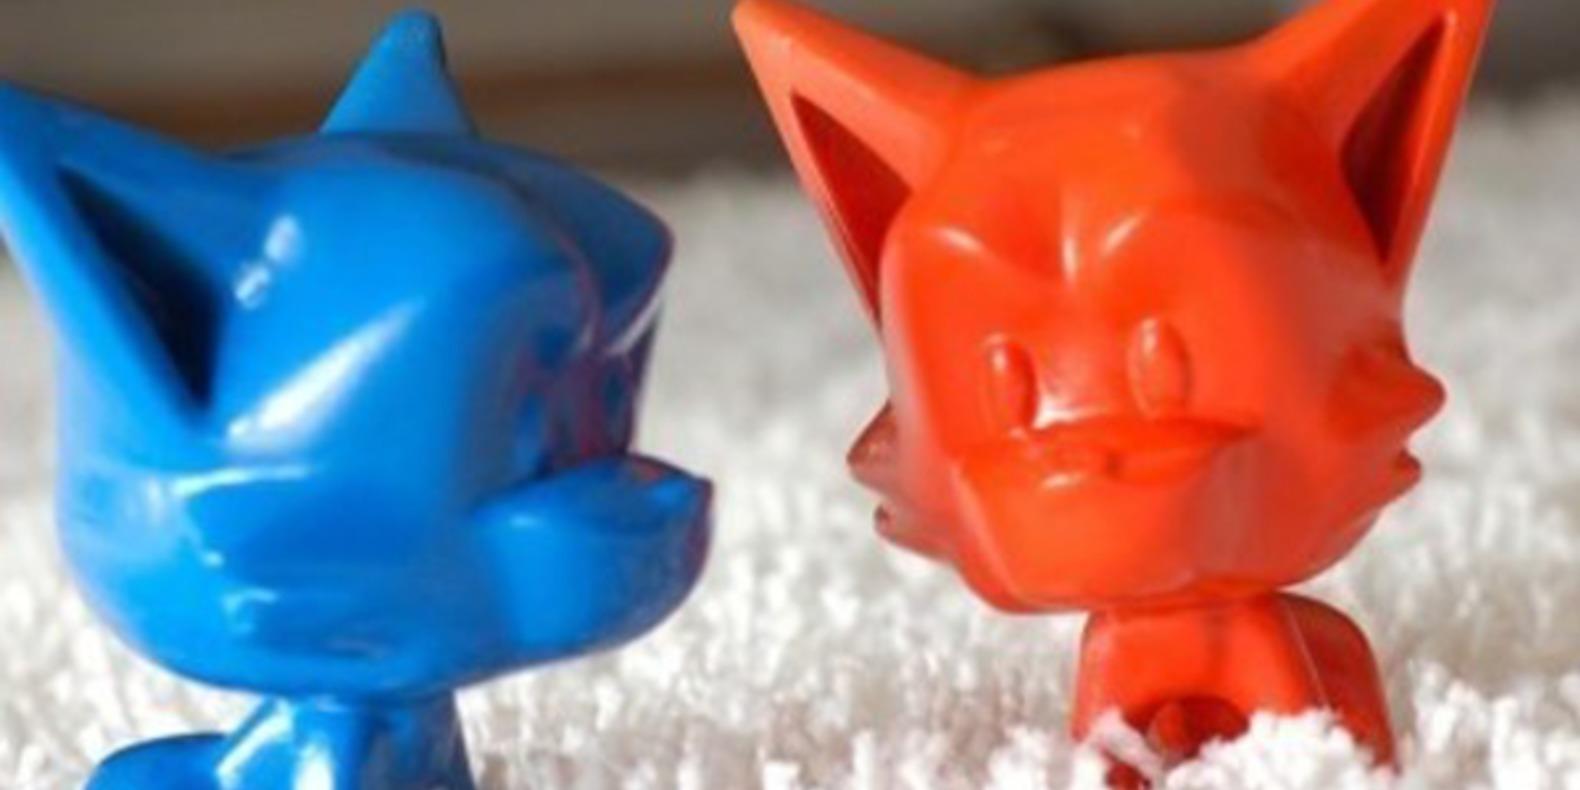 8.Huskys-HelloBard jouets imprimés en 3D